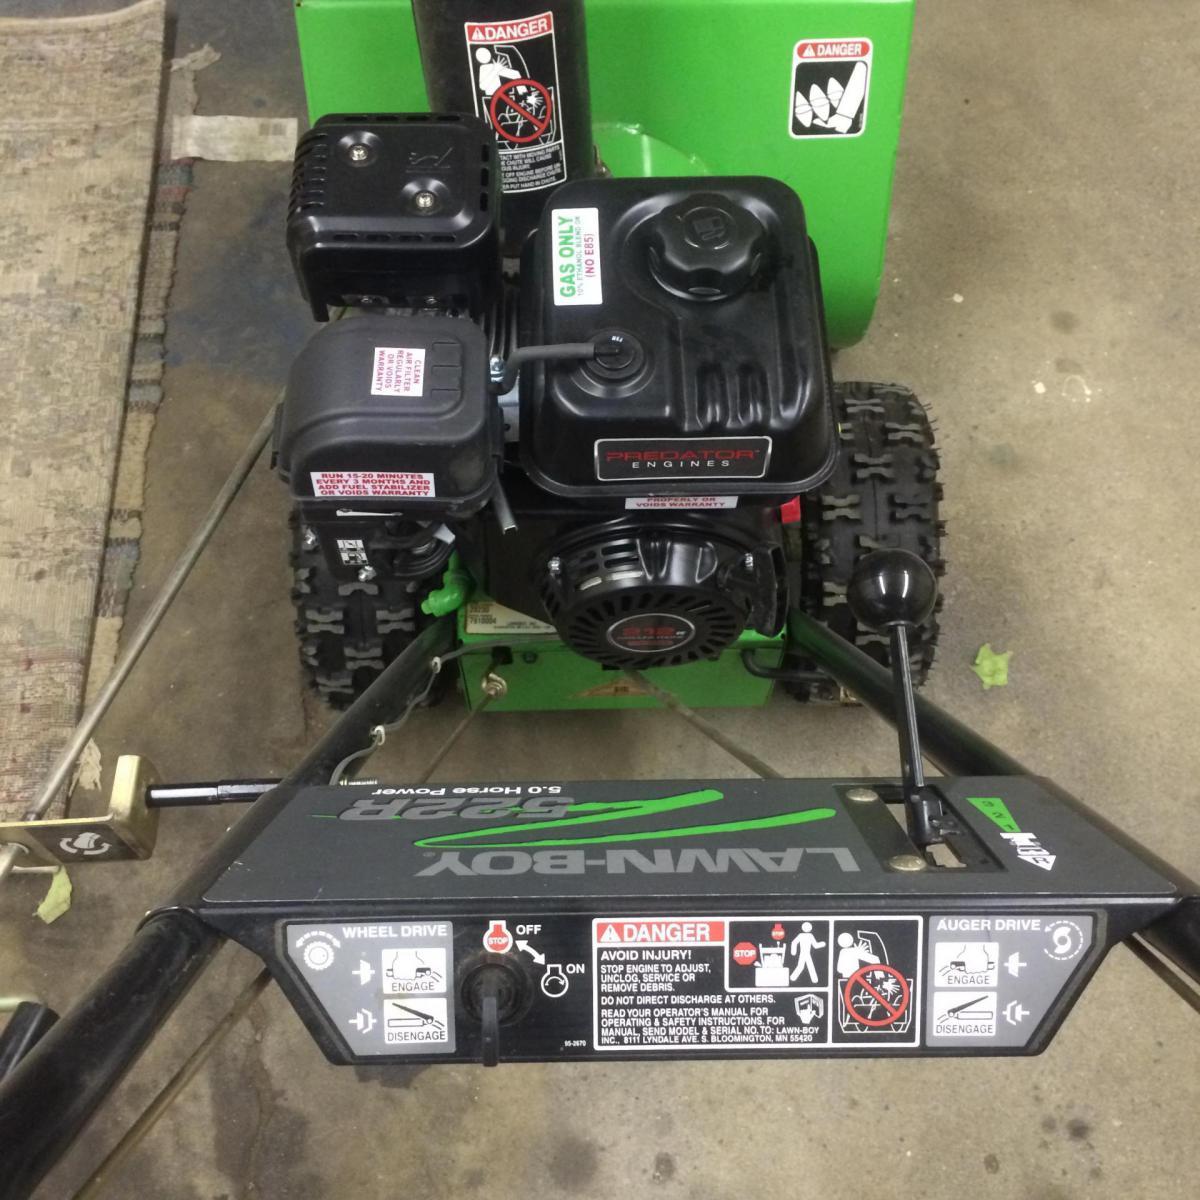 Lawn Boy 522r predator 212 install - Snowblower Forum : Snow